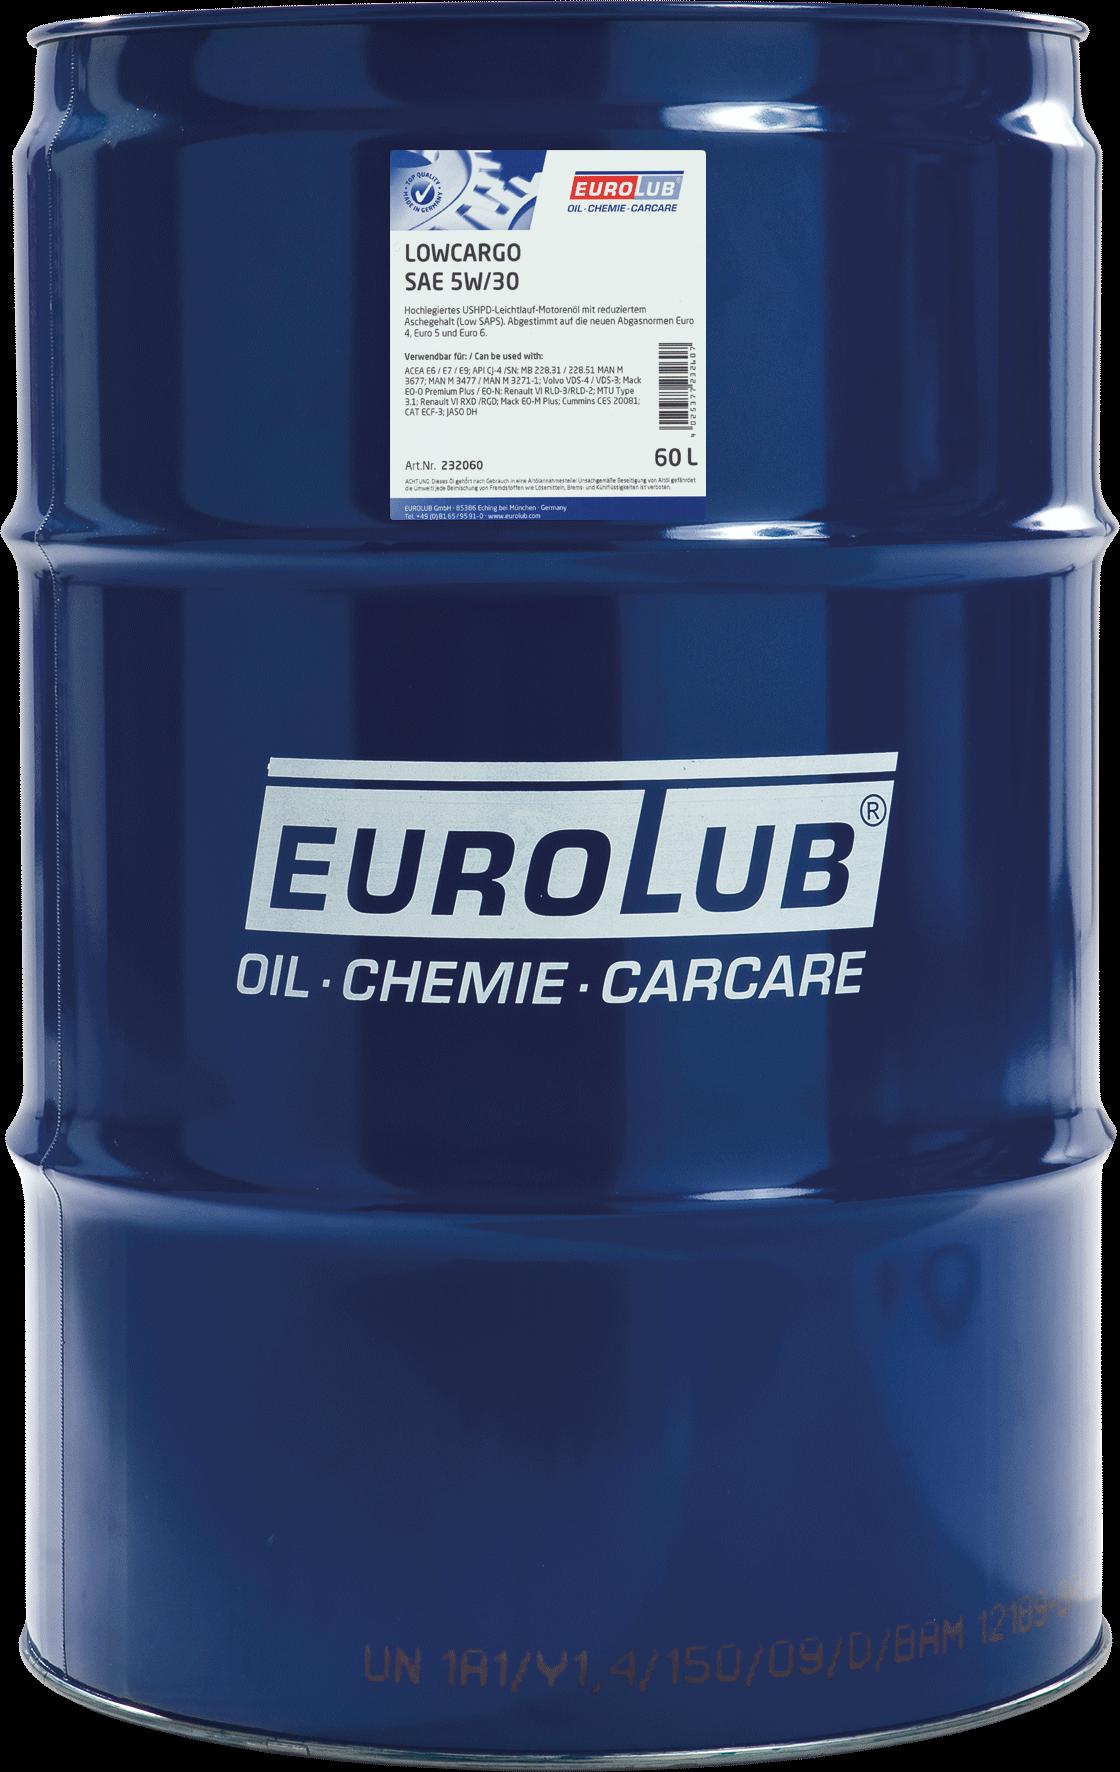 EUROLUB LOWCARGO SAE 5W/30 (синтетическое, LowSAPS), 60л